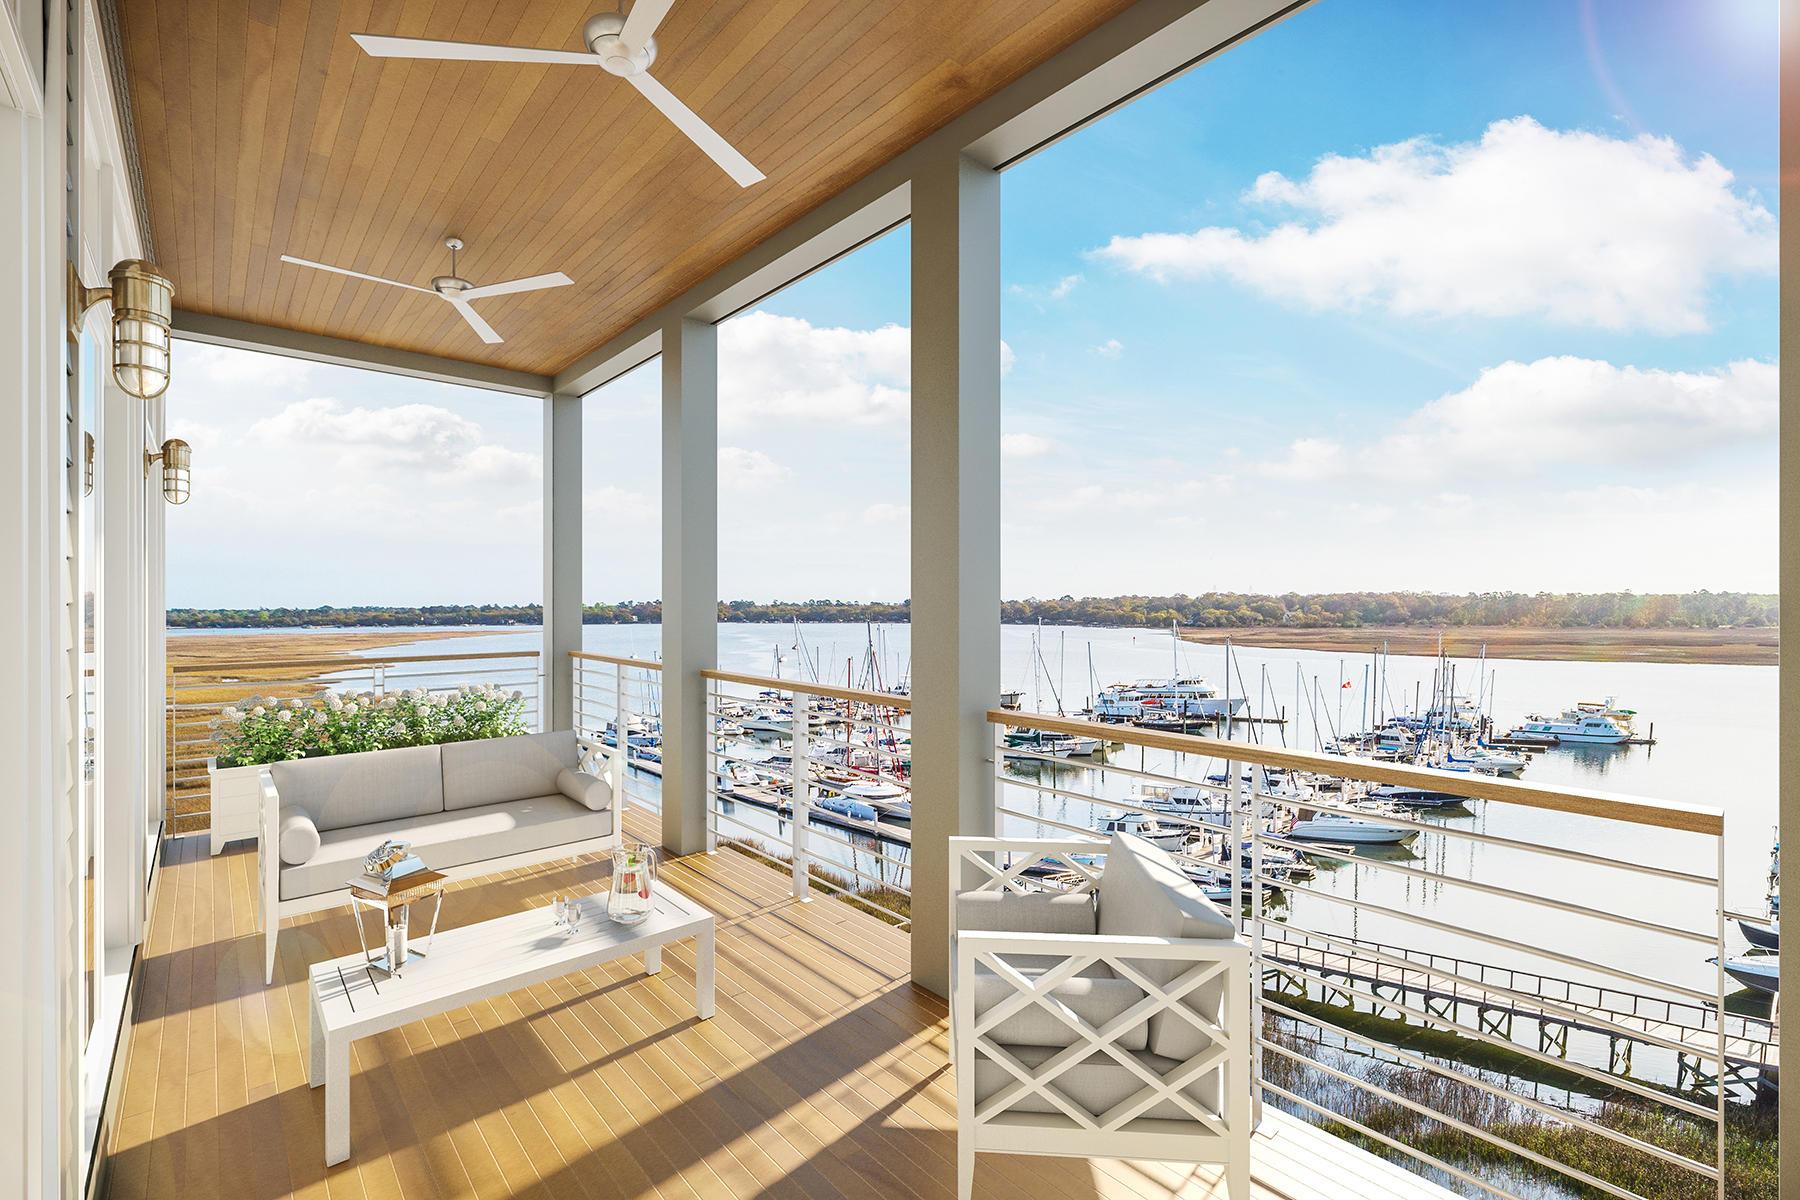 St. Johns Yacht Harbor Homes For Sale - 2408 Maybank, Johns Island, SC - 10